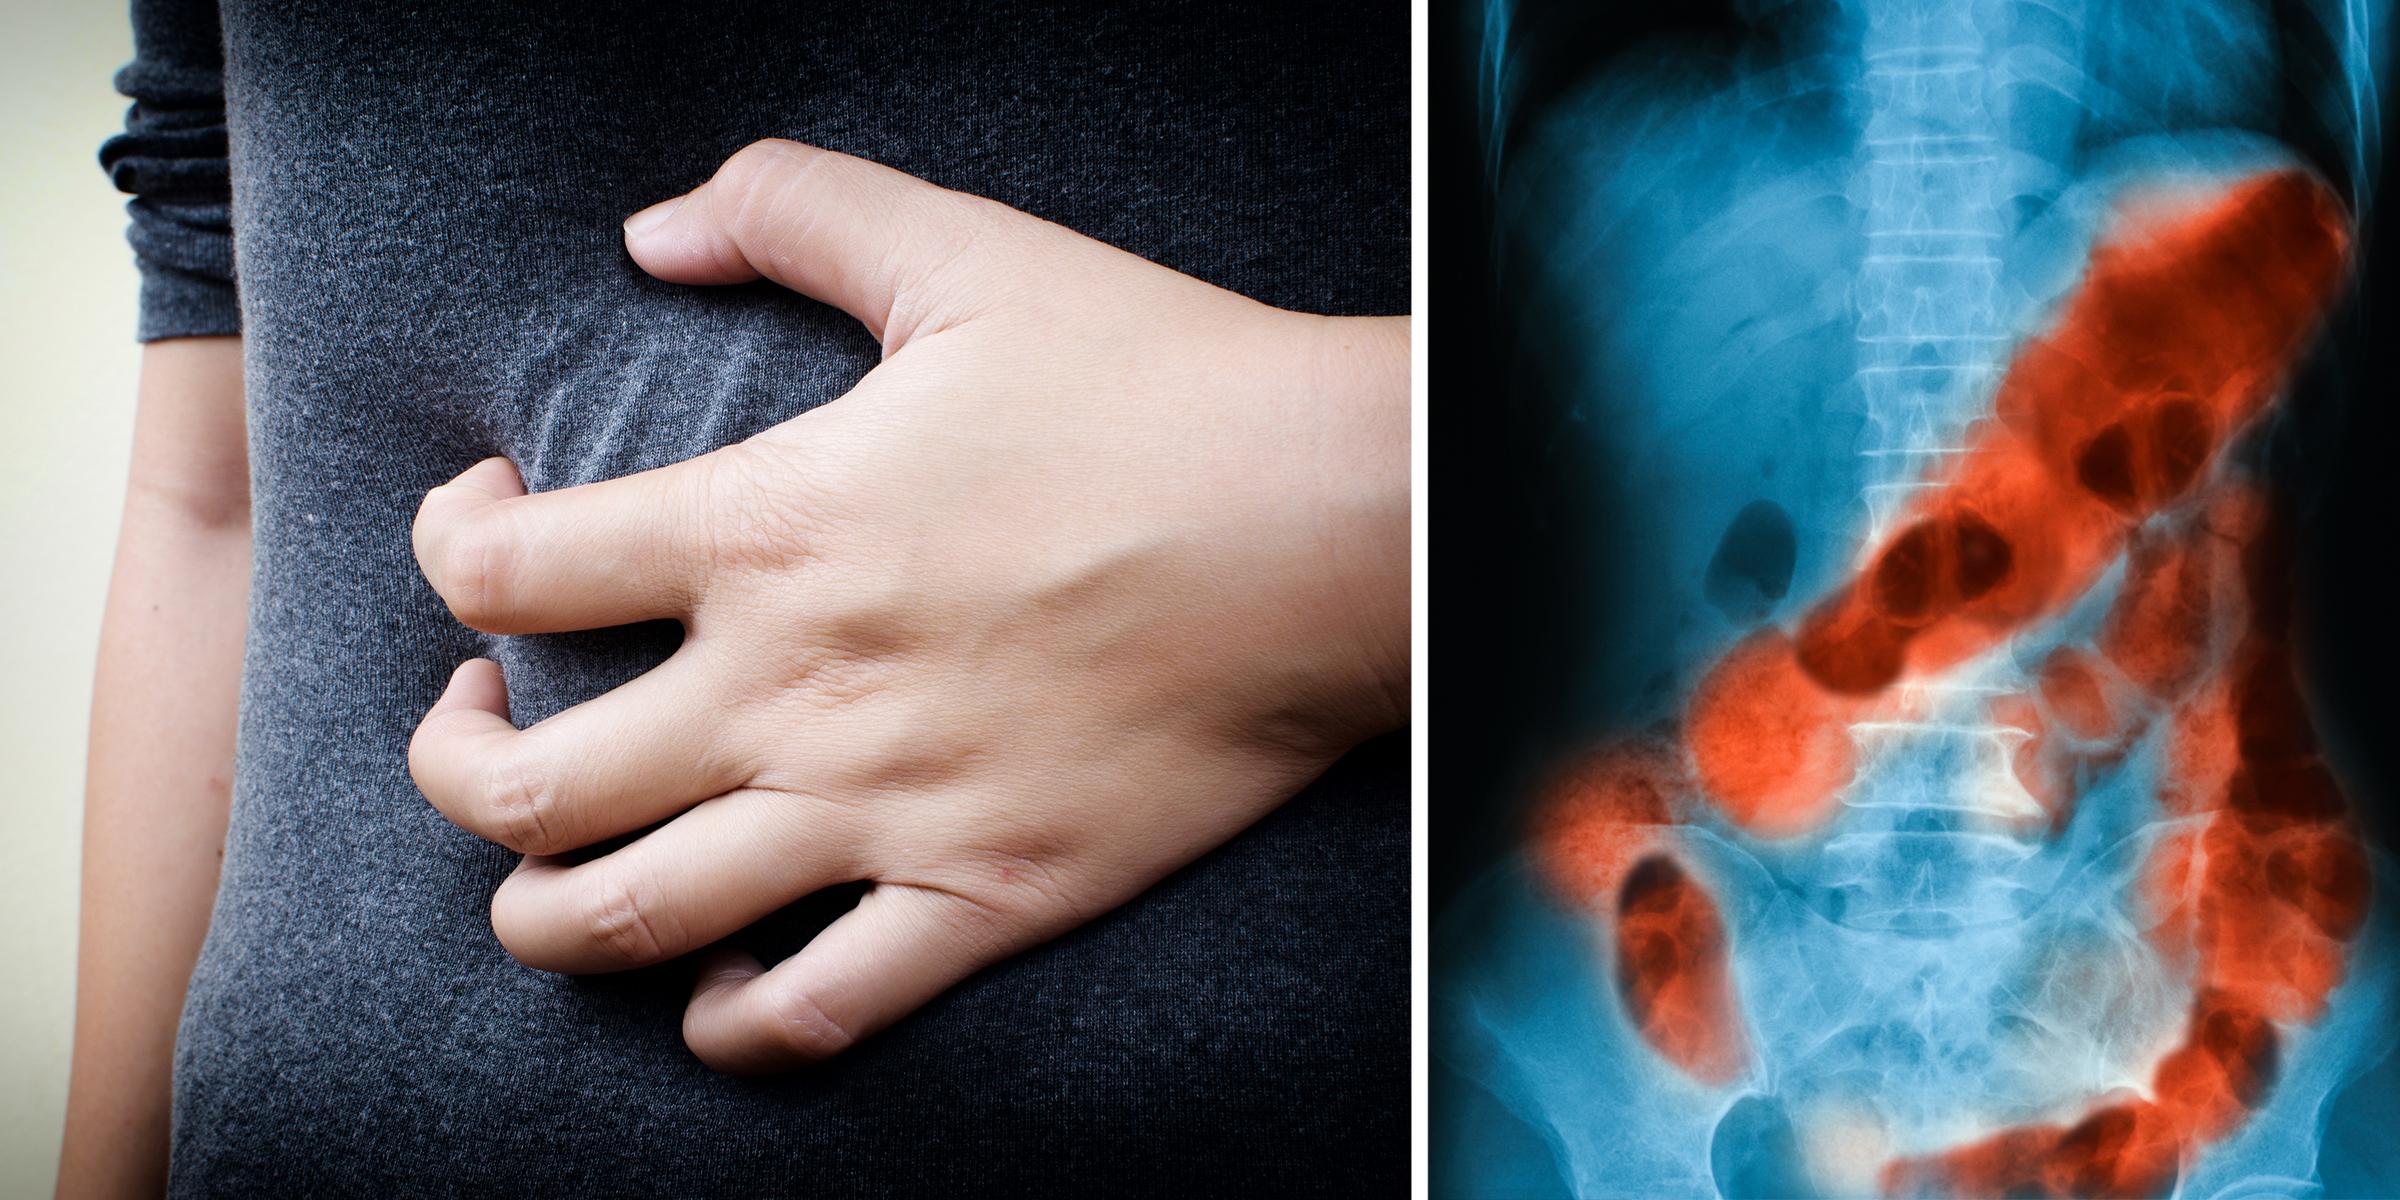 helmintikus terápia lupus papillomavírus onkogén sejtjei